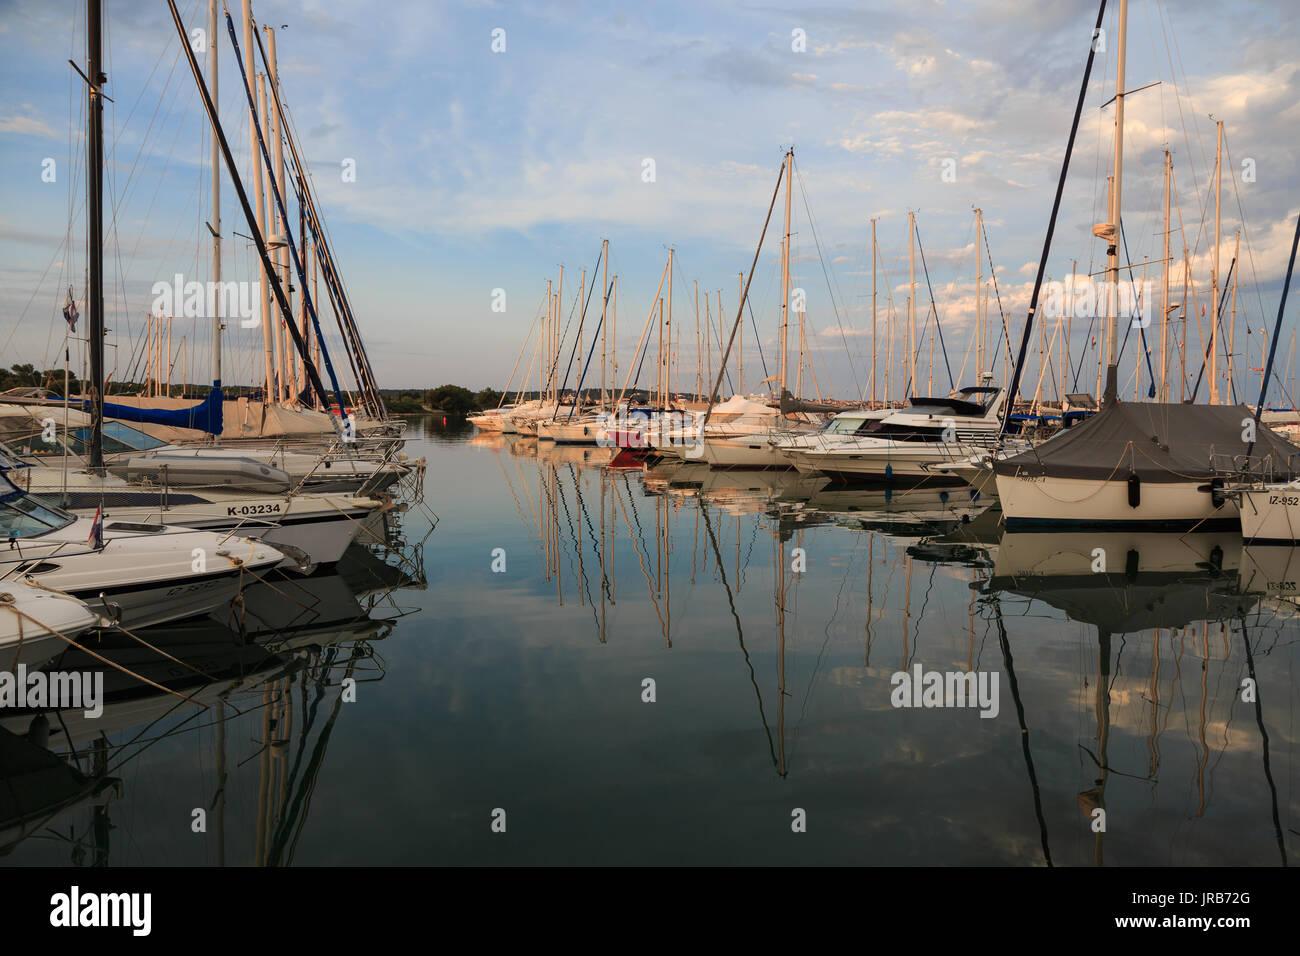 ACI marina, Pomer, Croatia - Stock Image